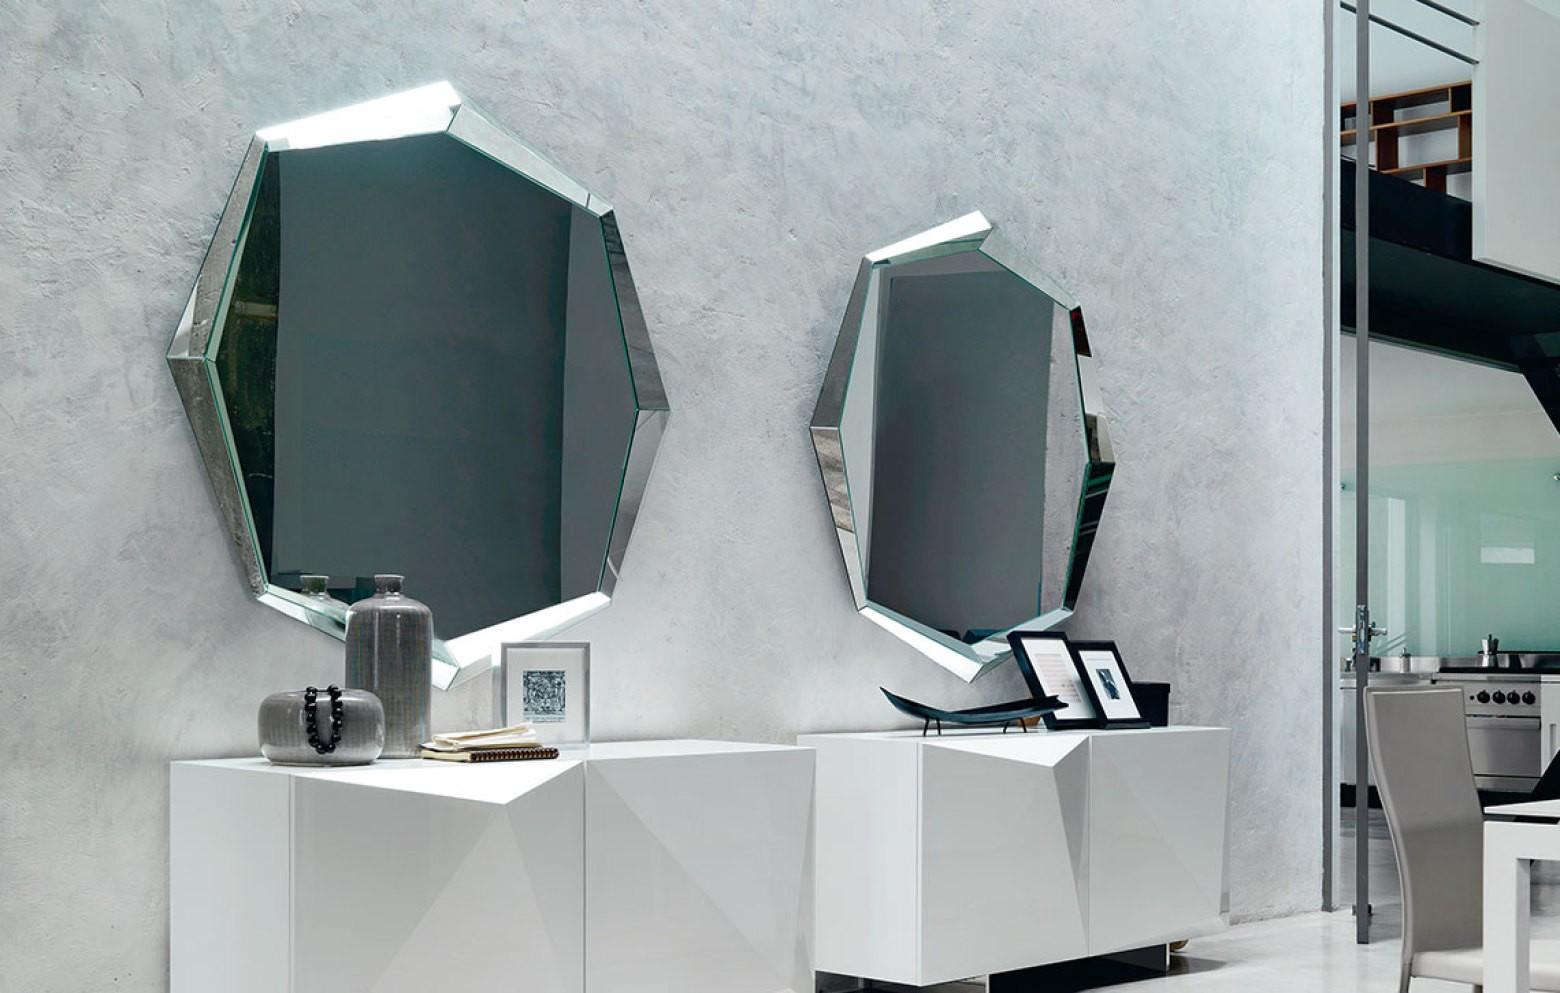 emerald spiegel kleinm bel accessoires who 39 s perfect. Black Bedroom Furniture Sets. Home Design Ideas